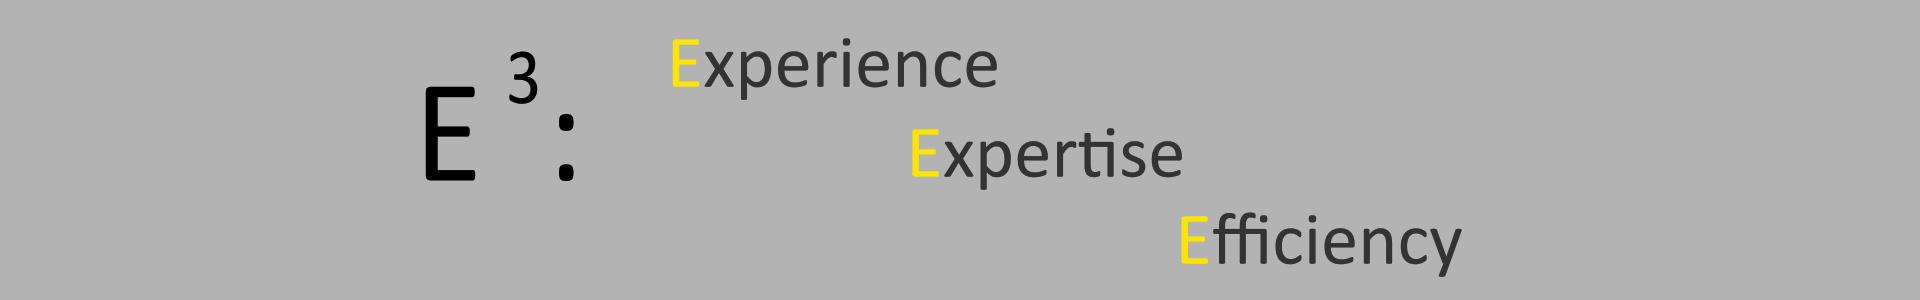 Expertise Optimoida